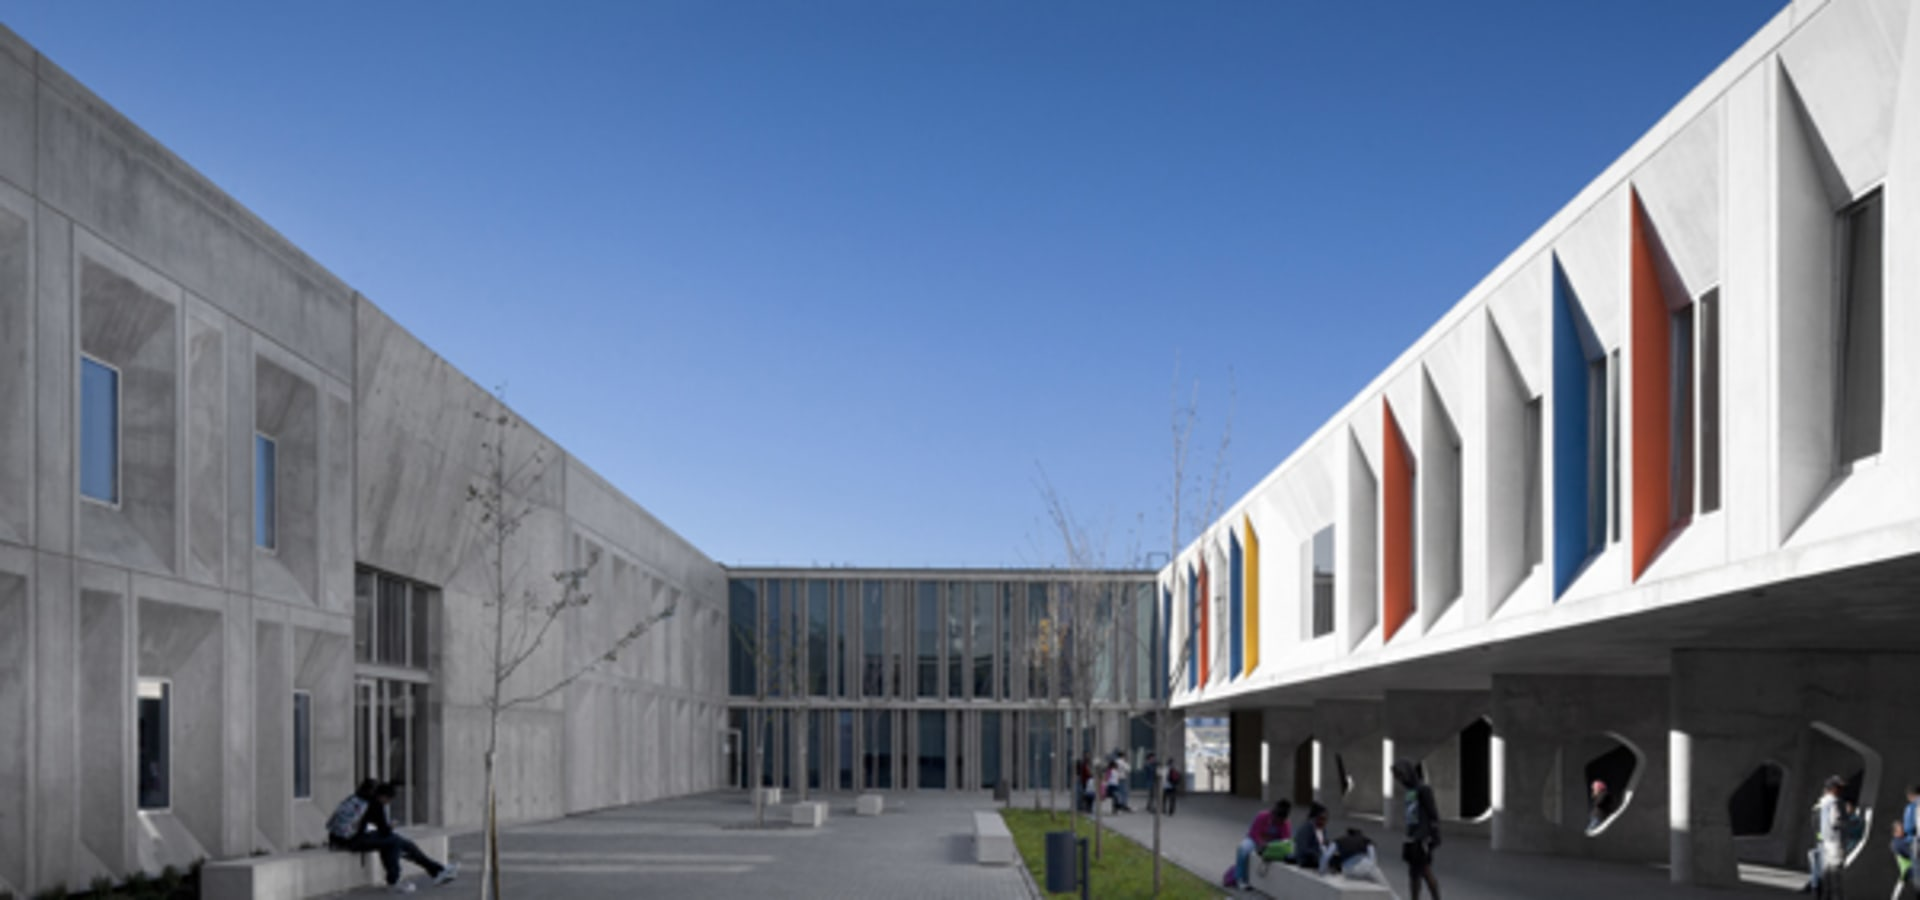 Becas Global Training Prácticas profesionales remuneradas en CVDV arquitectos con Fundación Novia Salcedo